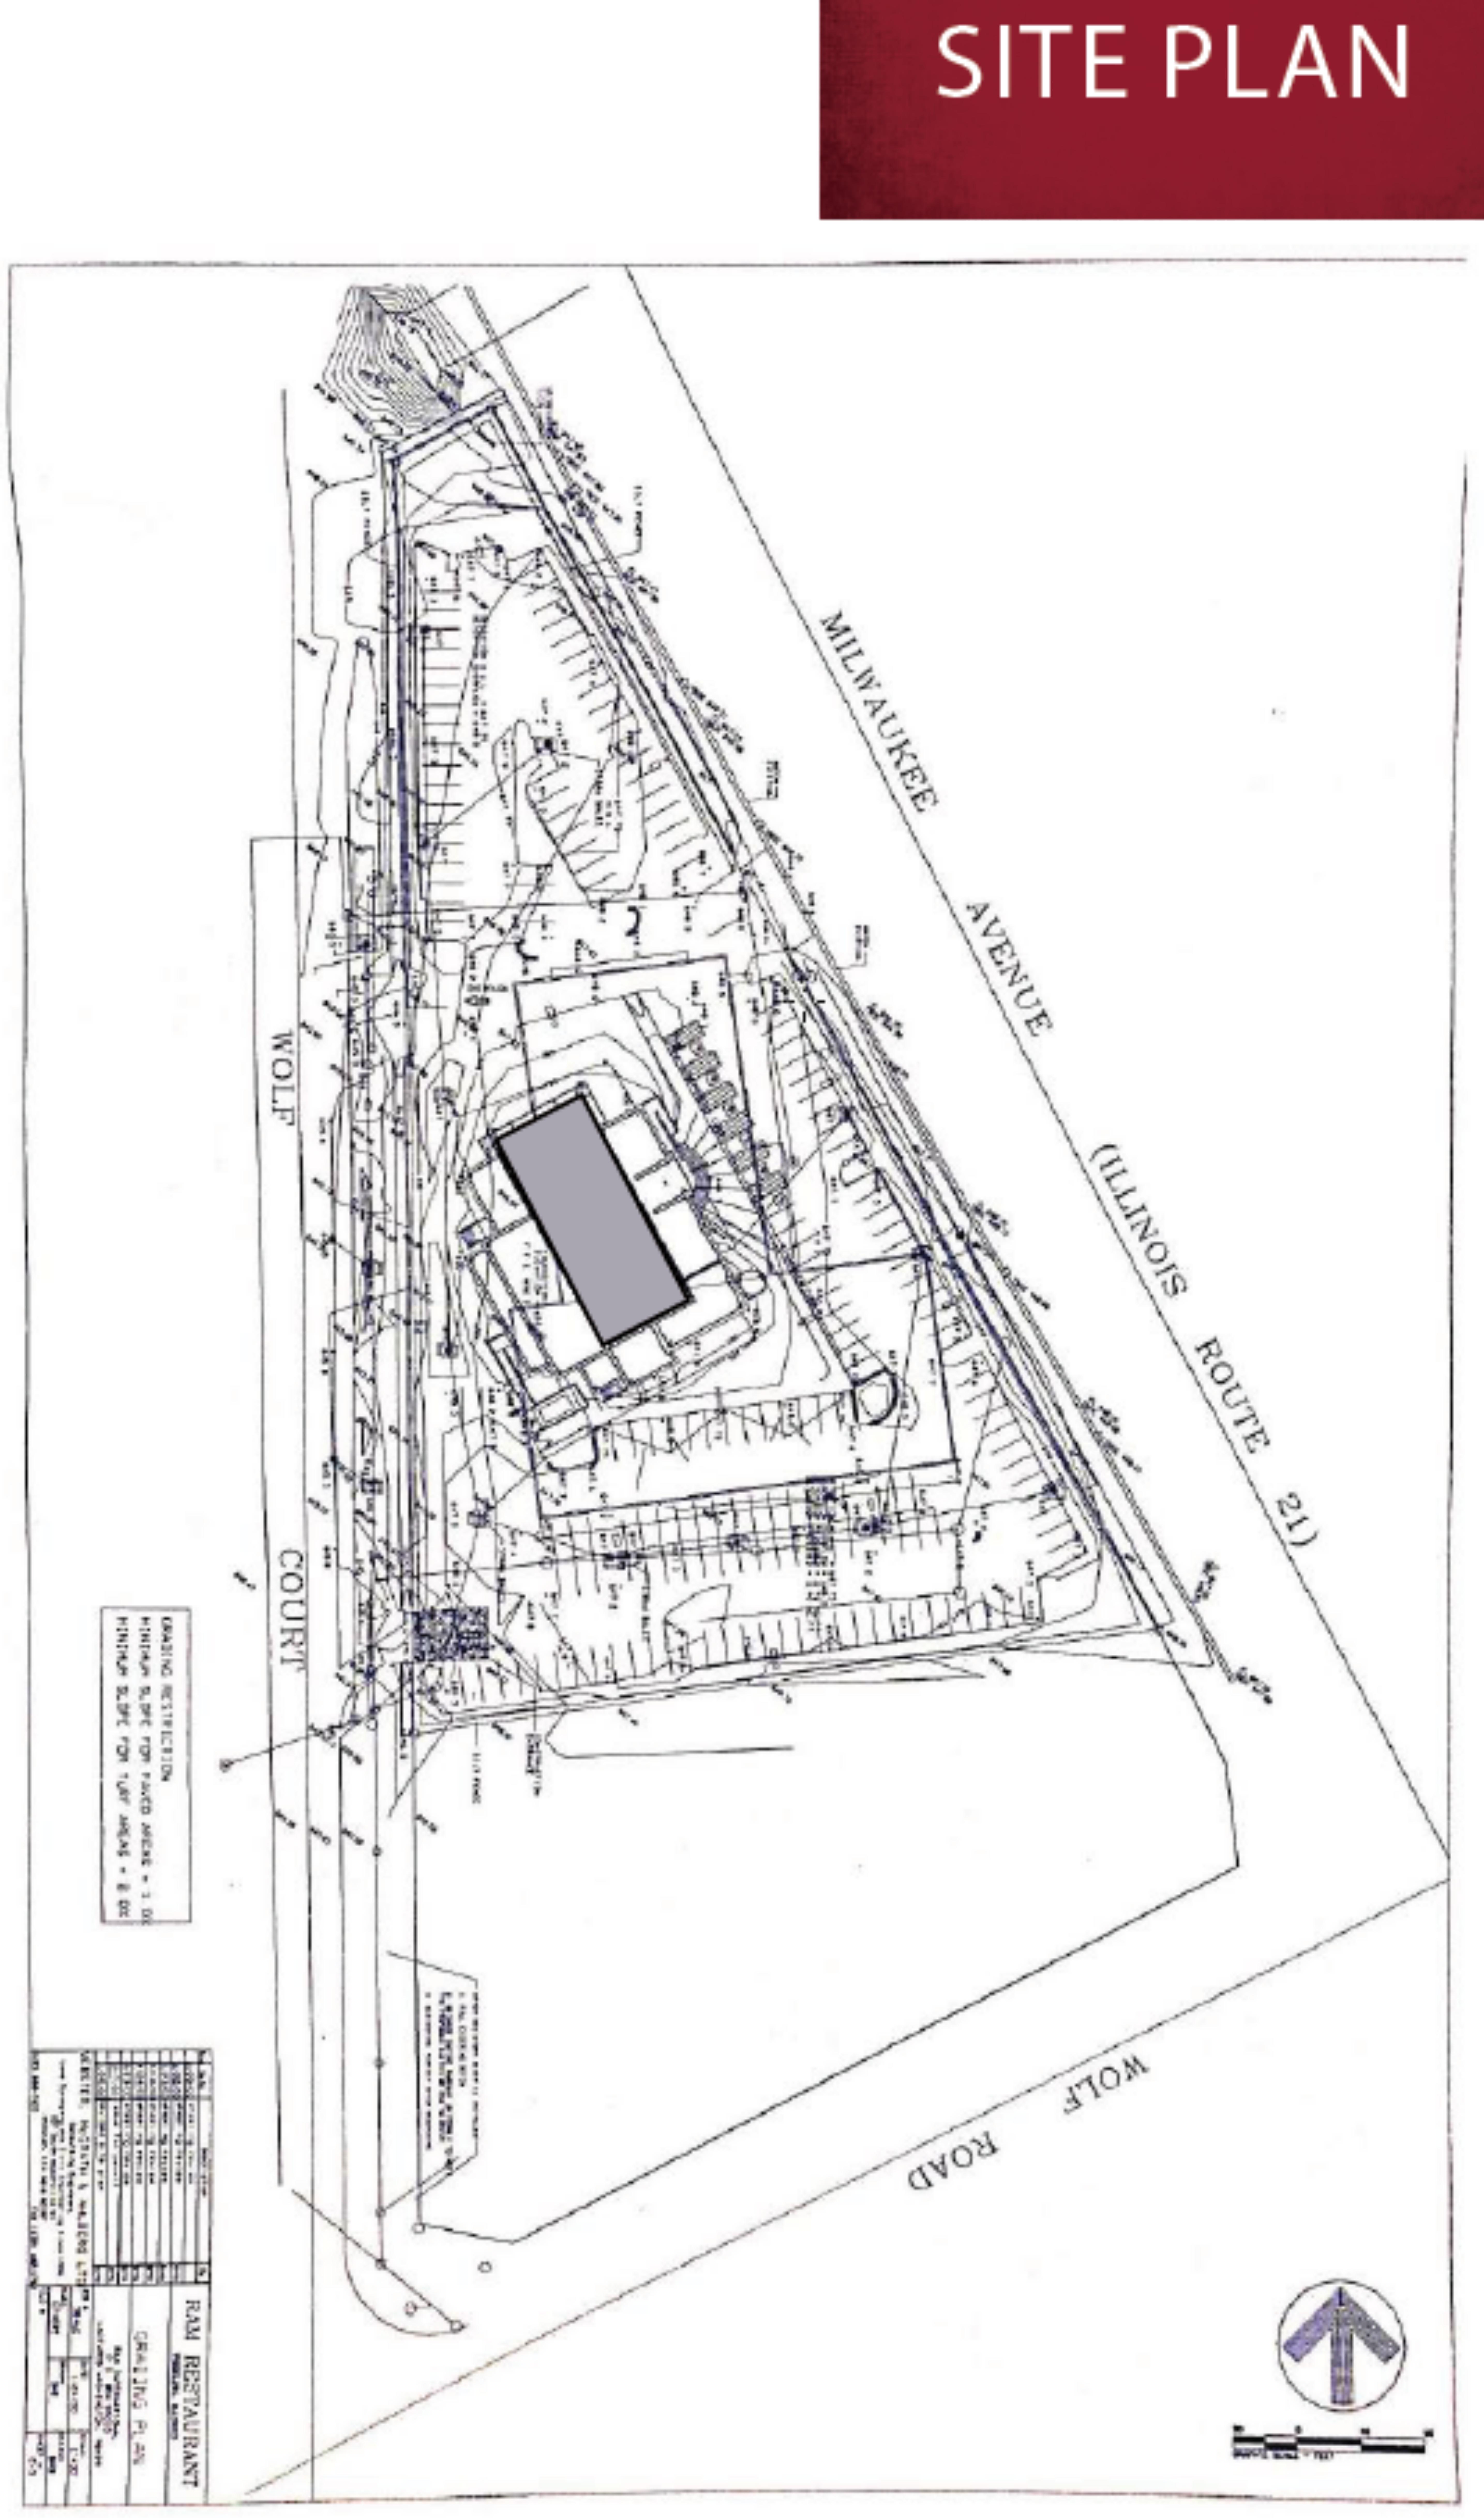 700 N Milwaukee Avenue: site plan